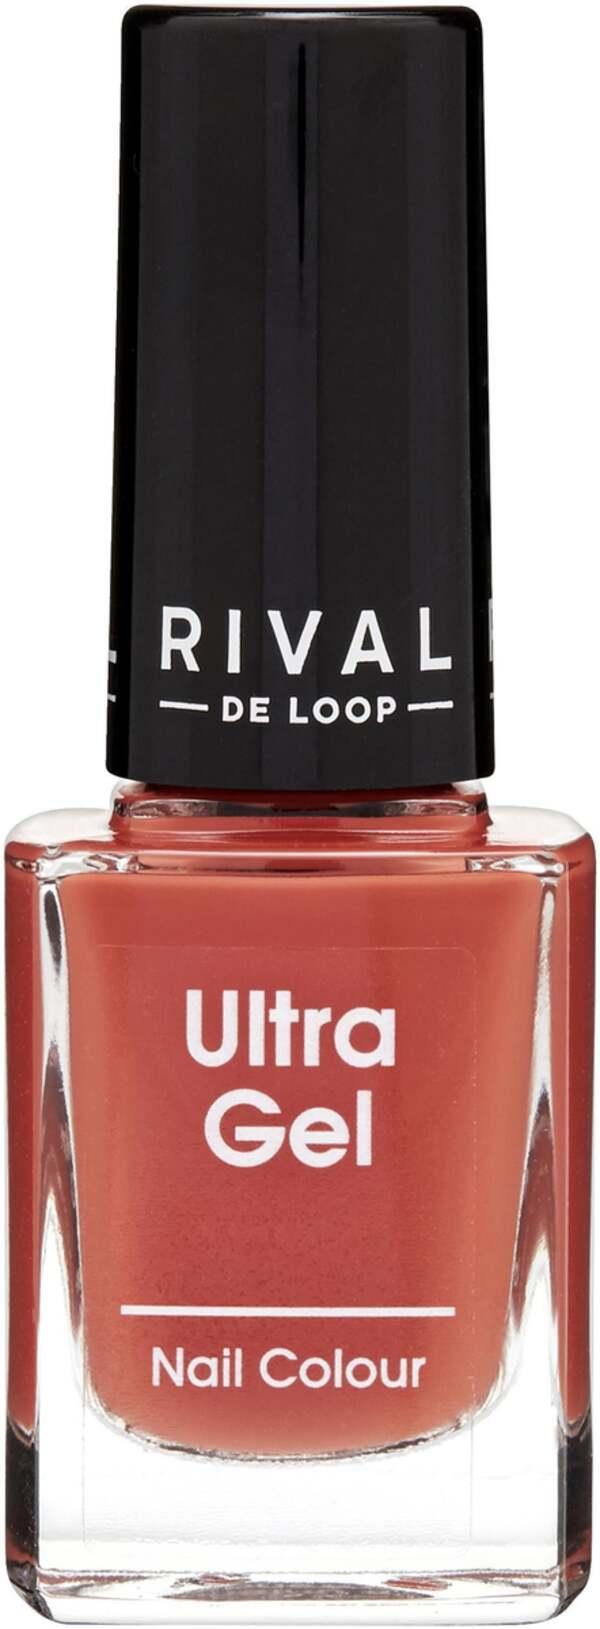 Rival de Loop Ultra Gel Nail Colour 23